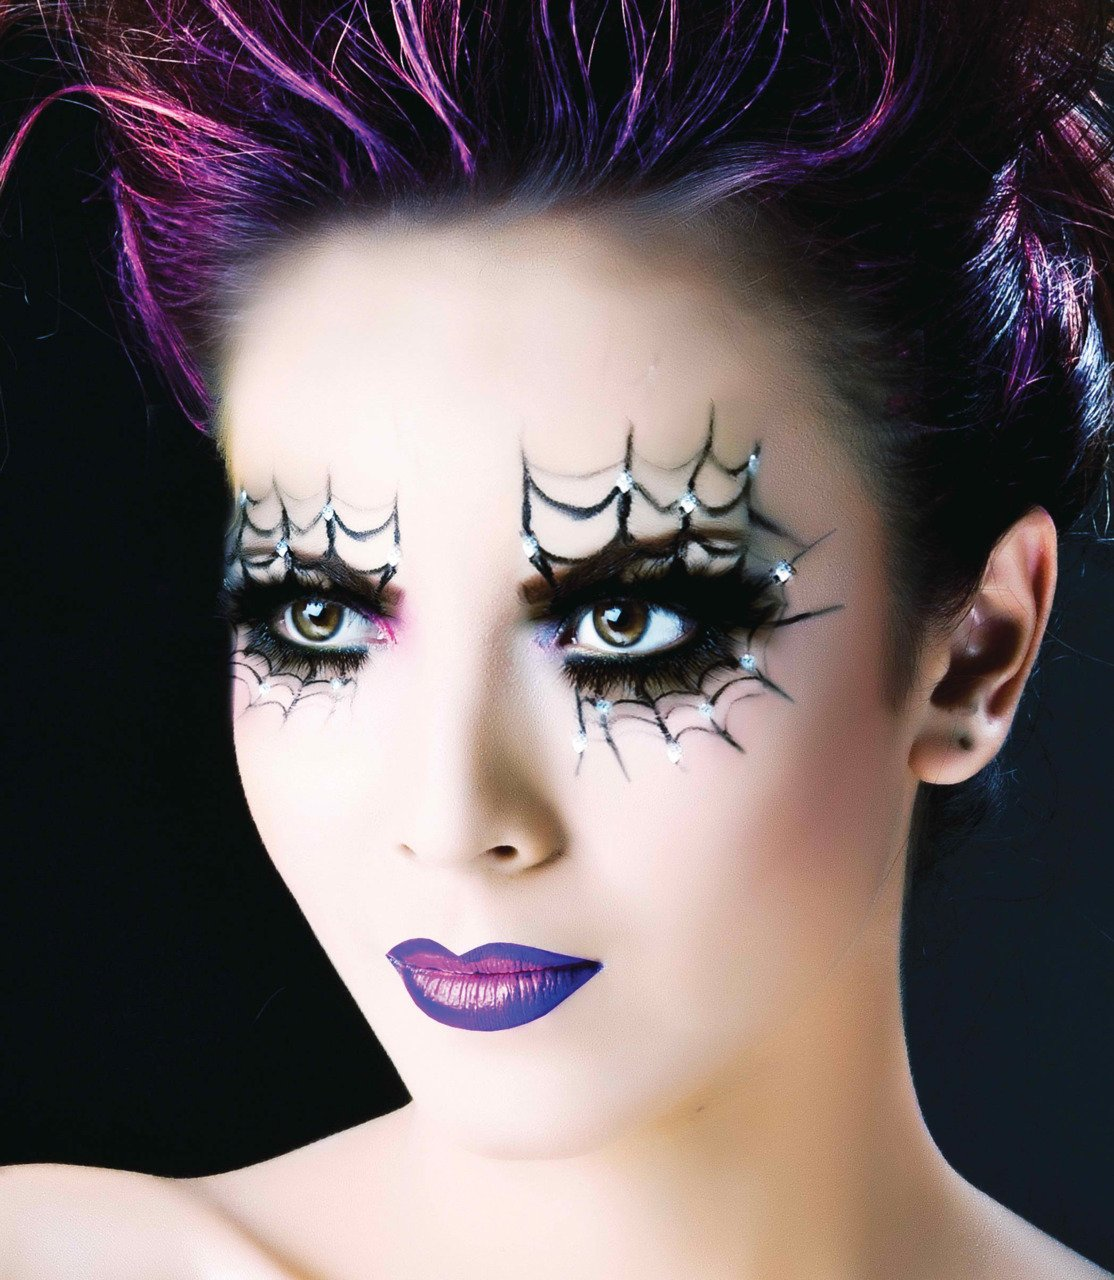 25 ideas para tener un maquillaje aterrador en halloween. Black Bedroom Furniture Sets. Home Design Ideas